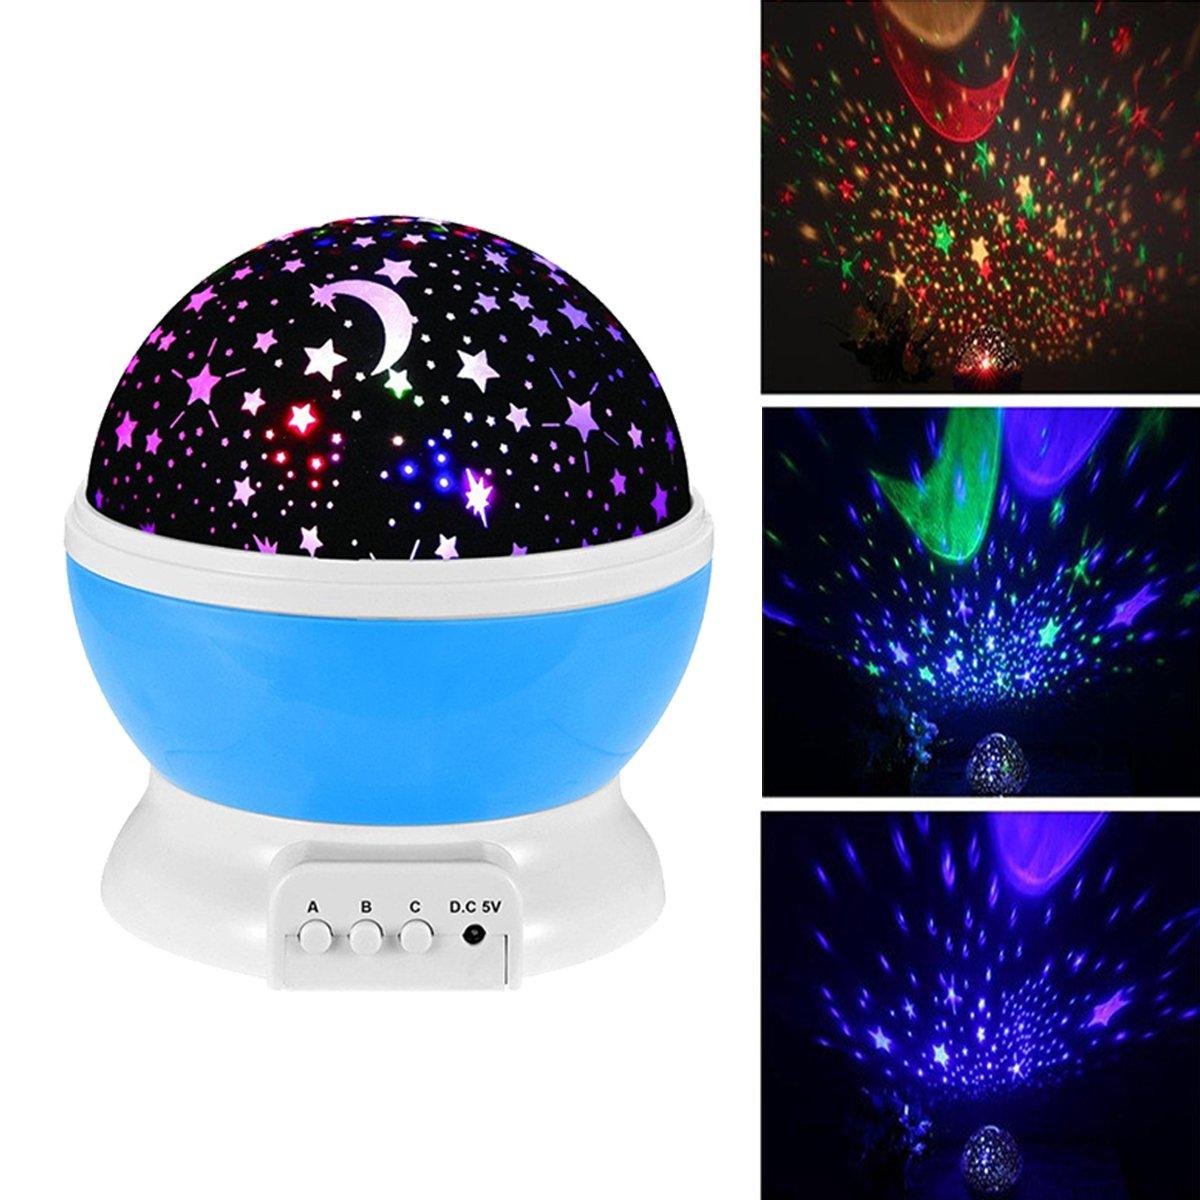 STARプロジェクタナイトライト360度回転天井投影Starry Night Light Lamp for KidsレディースメンズBestギフトwith USBケーブル ブルー 4328265547 B01NAQGQVG 15442 ブルー ブルー